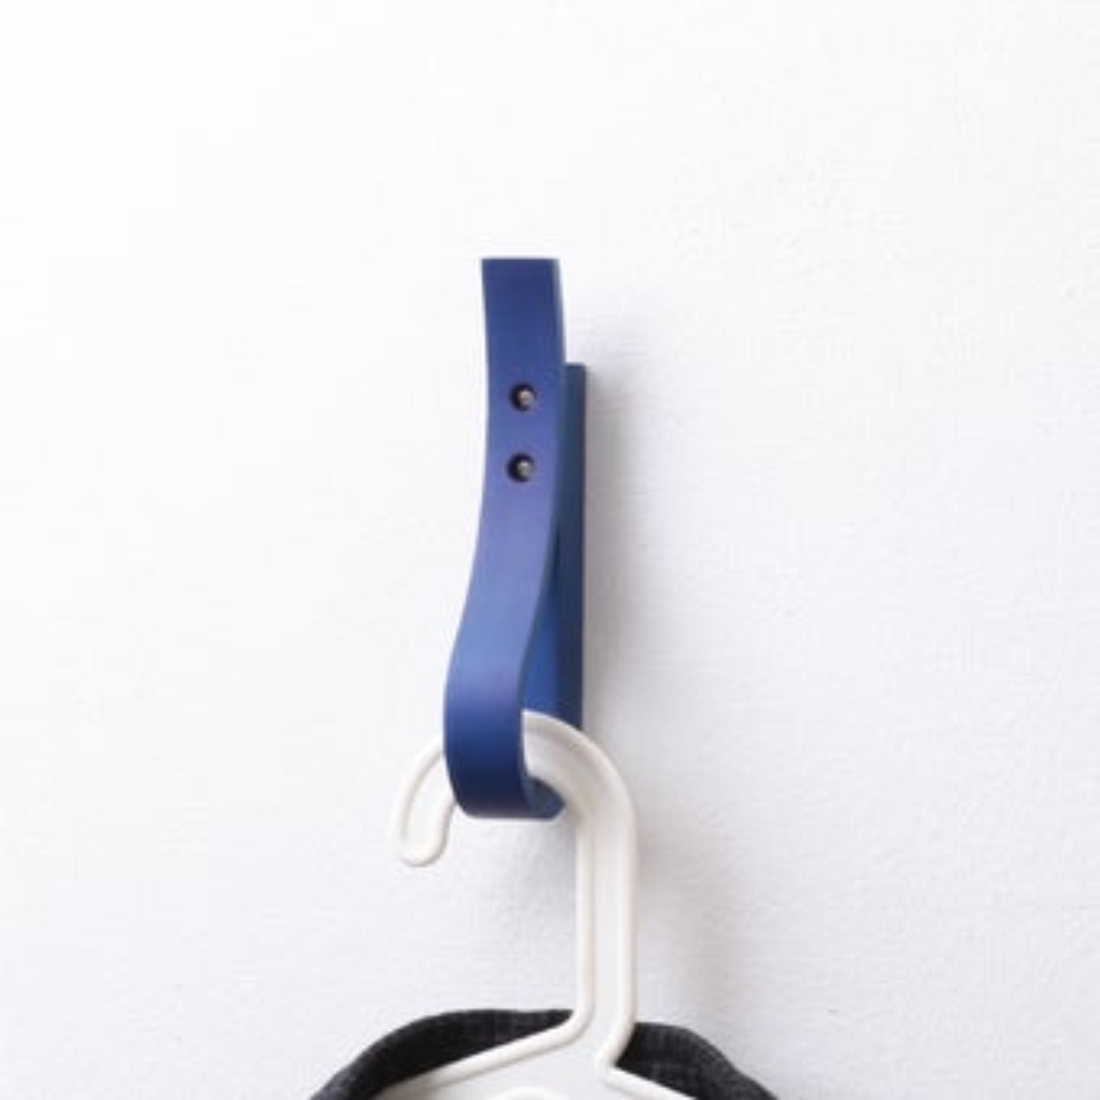 Pana objects ตะขอแขวน RIBBI Hook Midnight blue #PN-D027-NB สีไม้อ่อน01